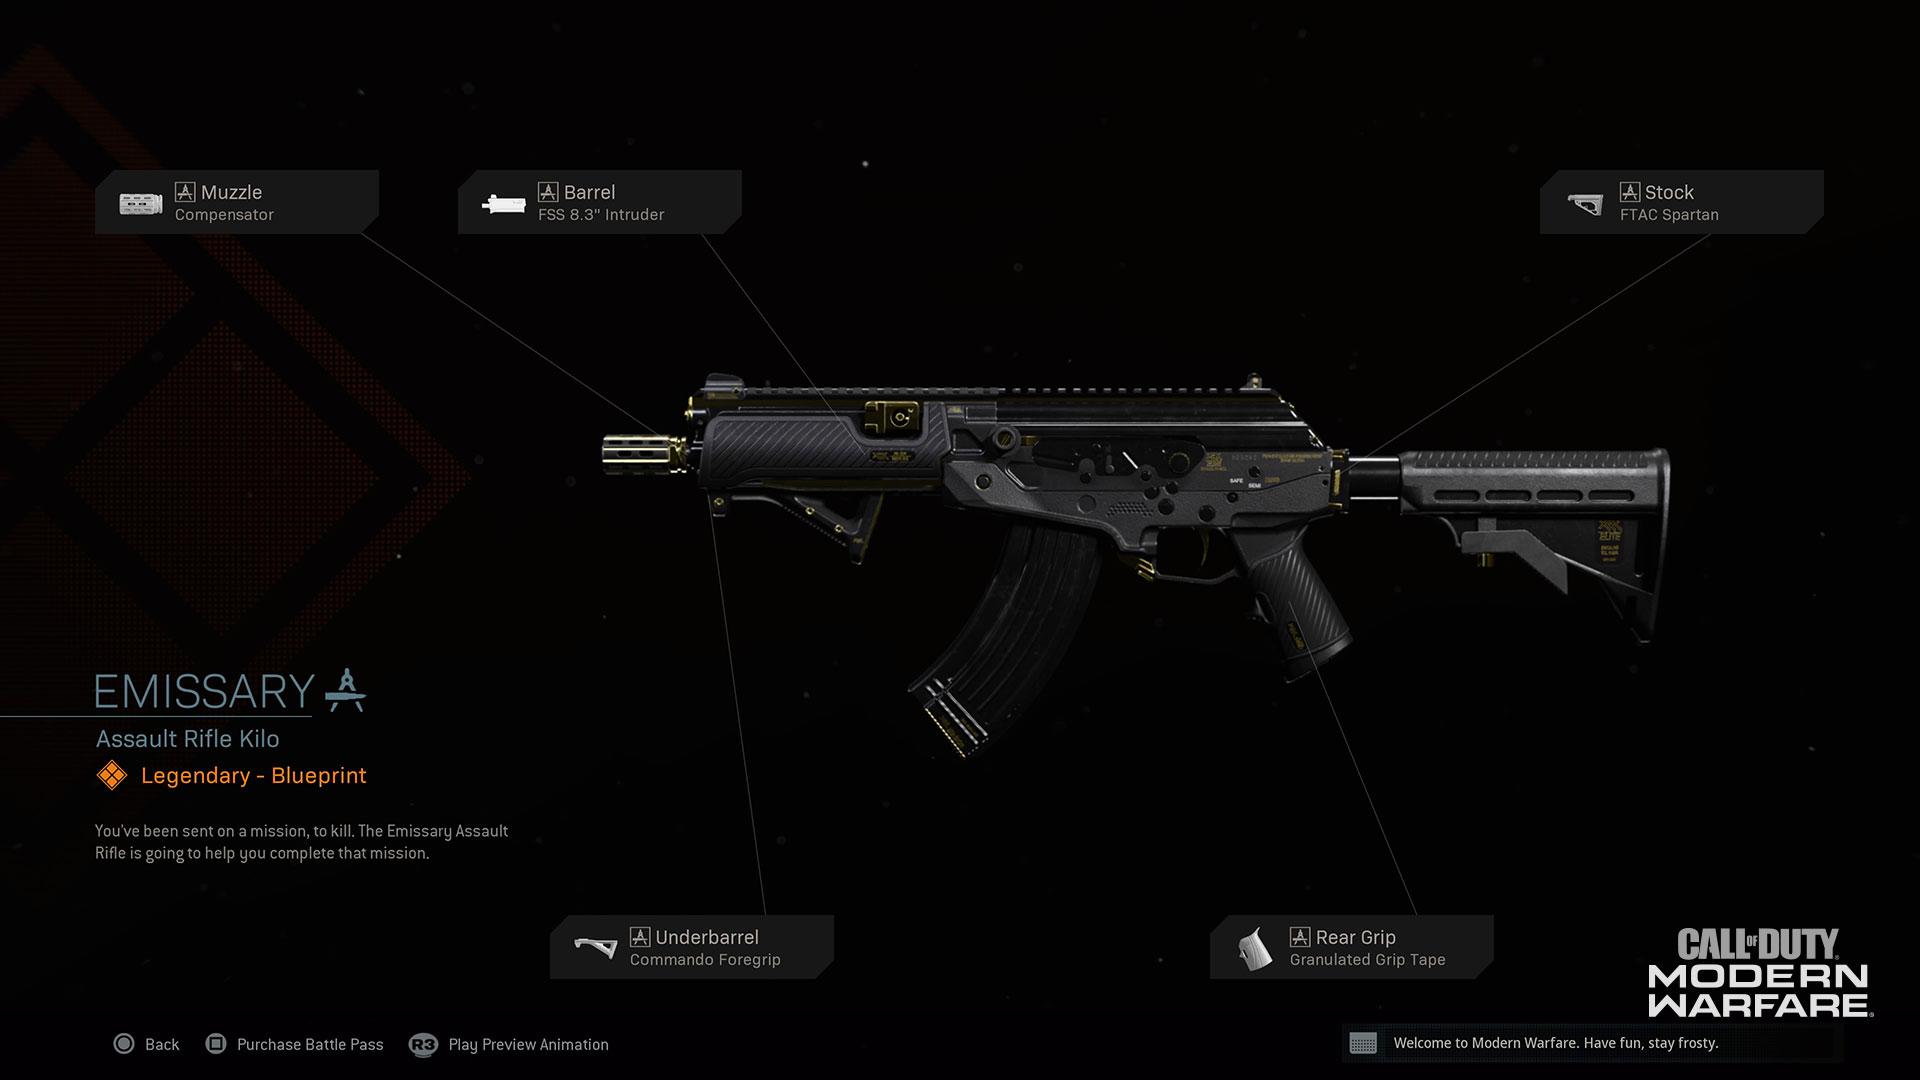 Modern Warfare® Weapon Detail: CR-56 AMAX - Image 5